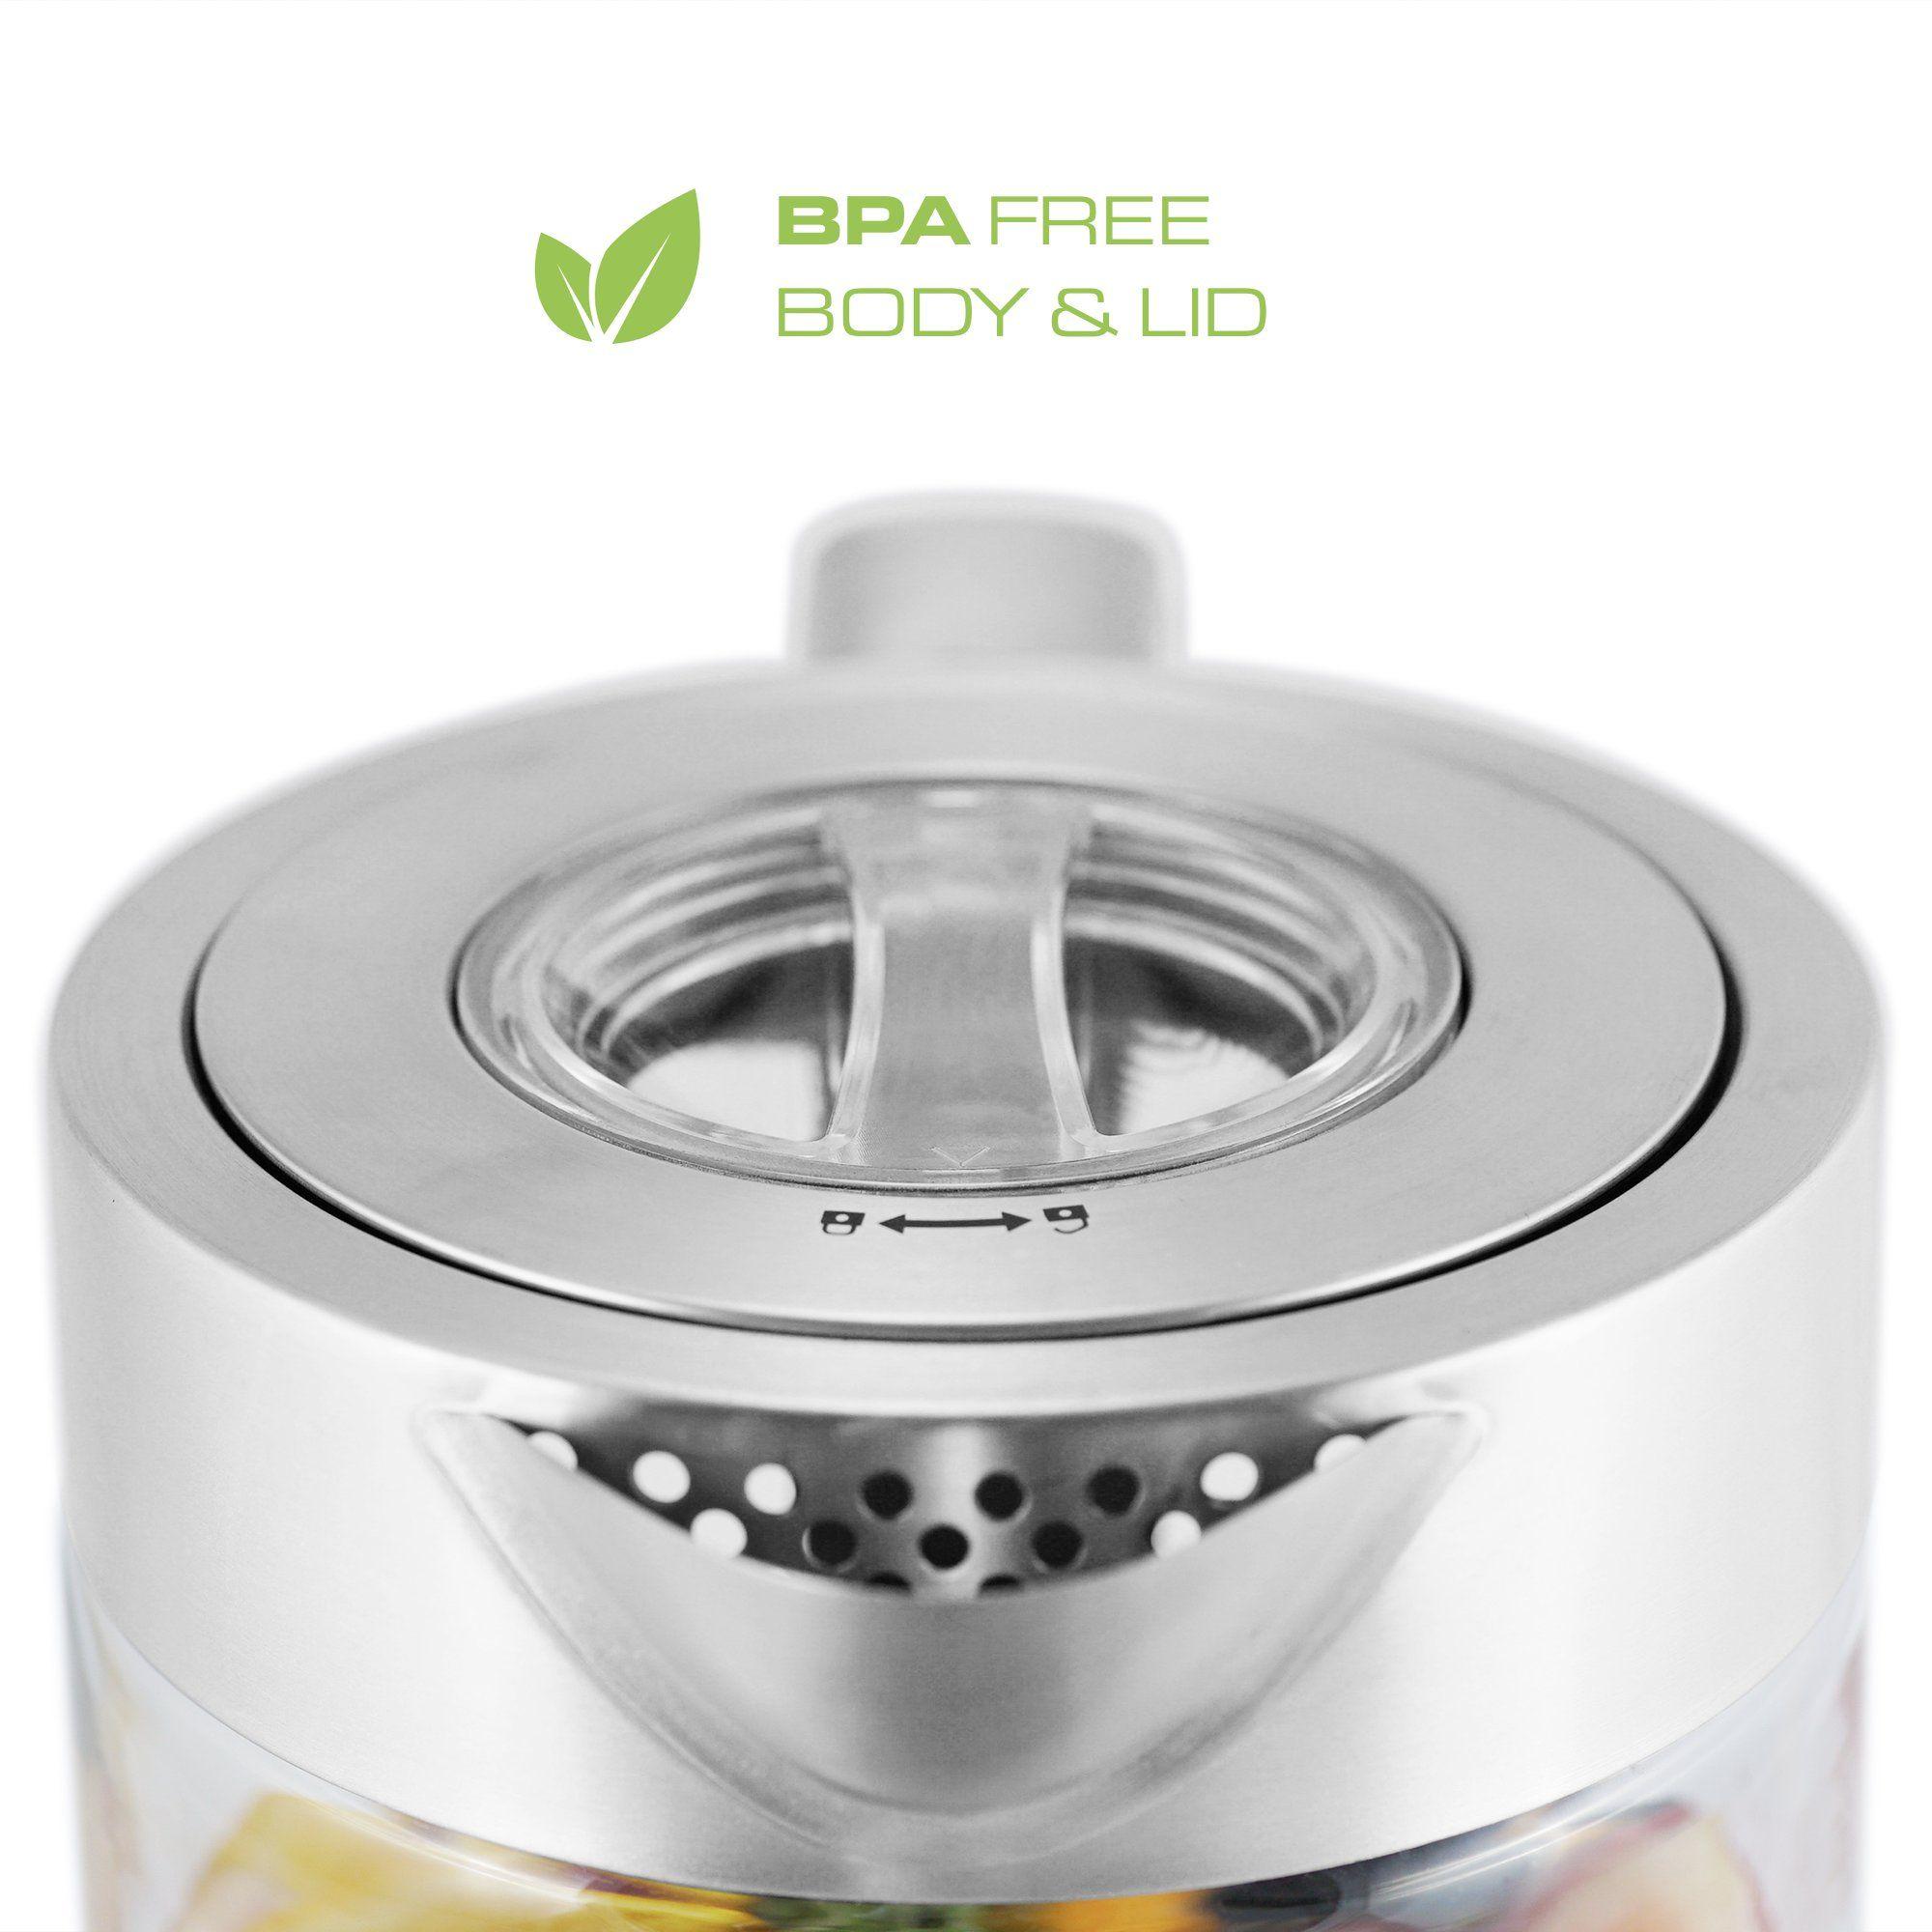 Viante ket electric glass tea maker kettle with removable tea